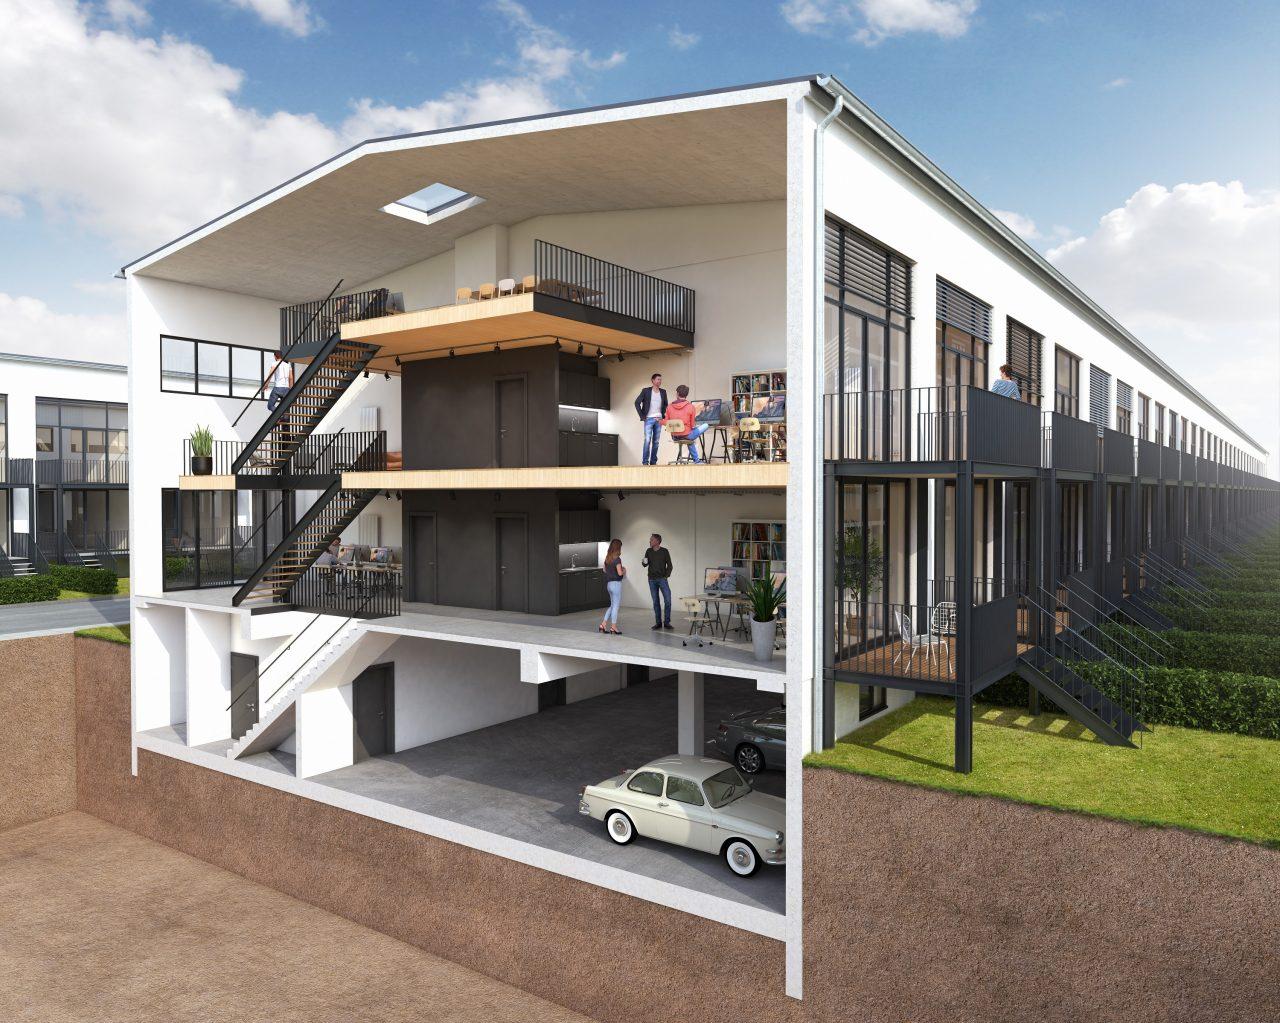 Atelierhäuser1-Schnitt2 03_21_web